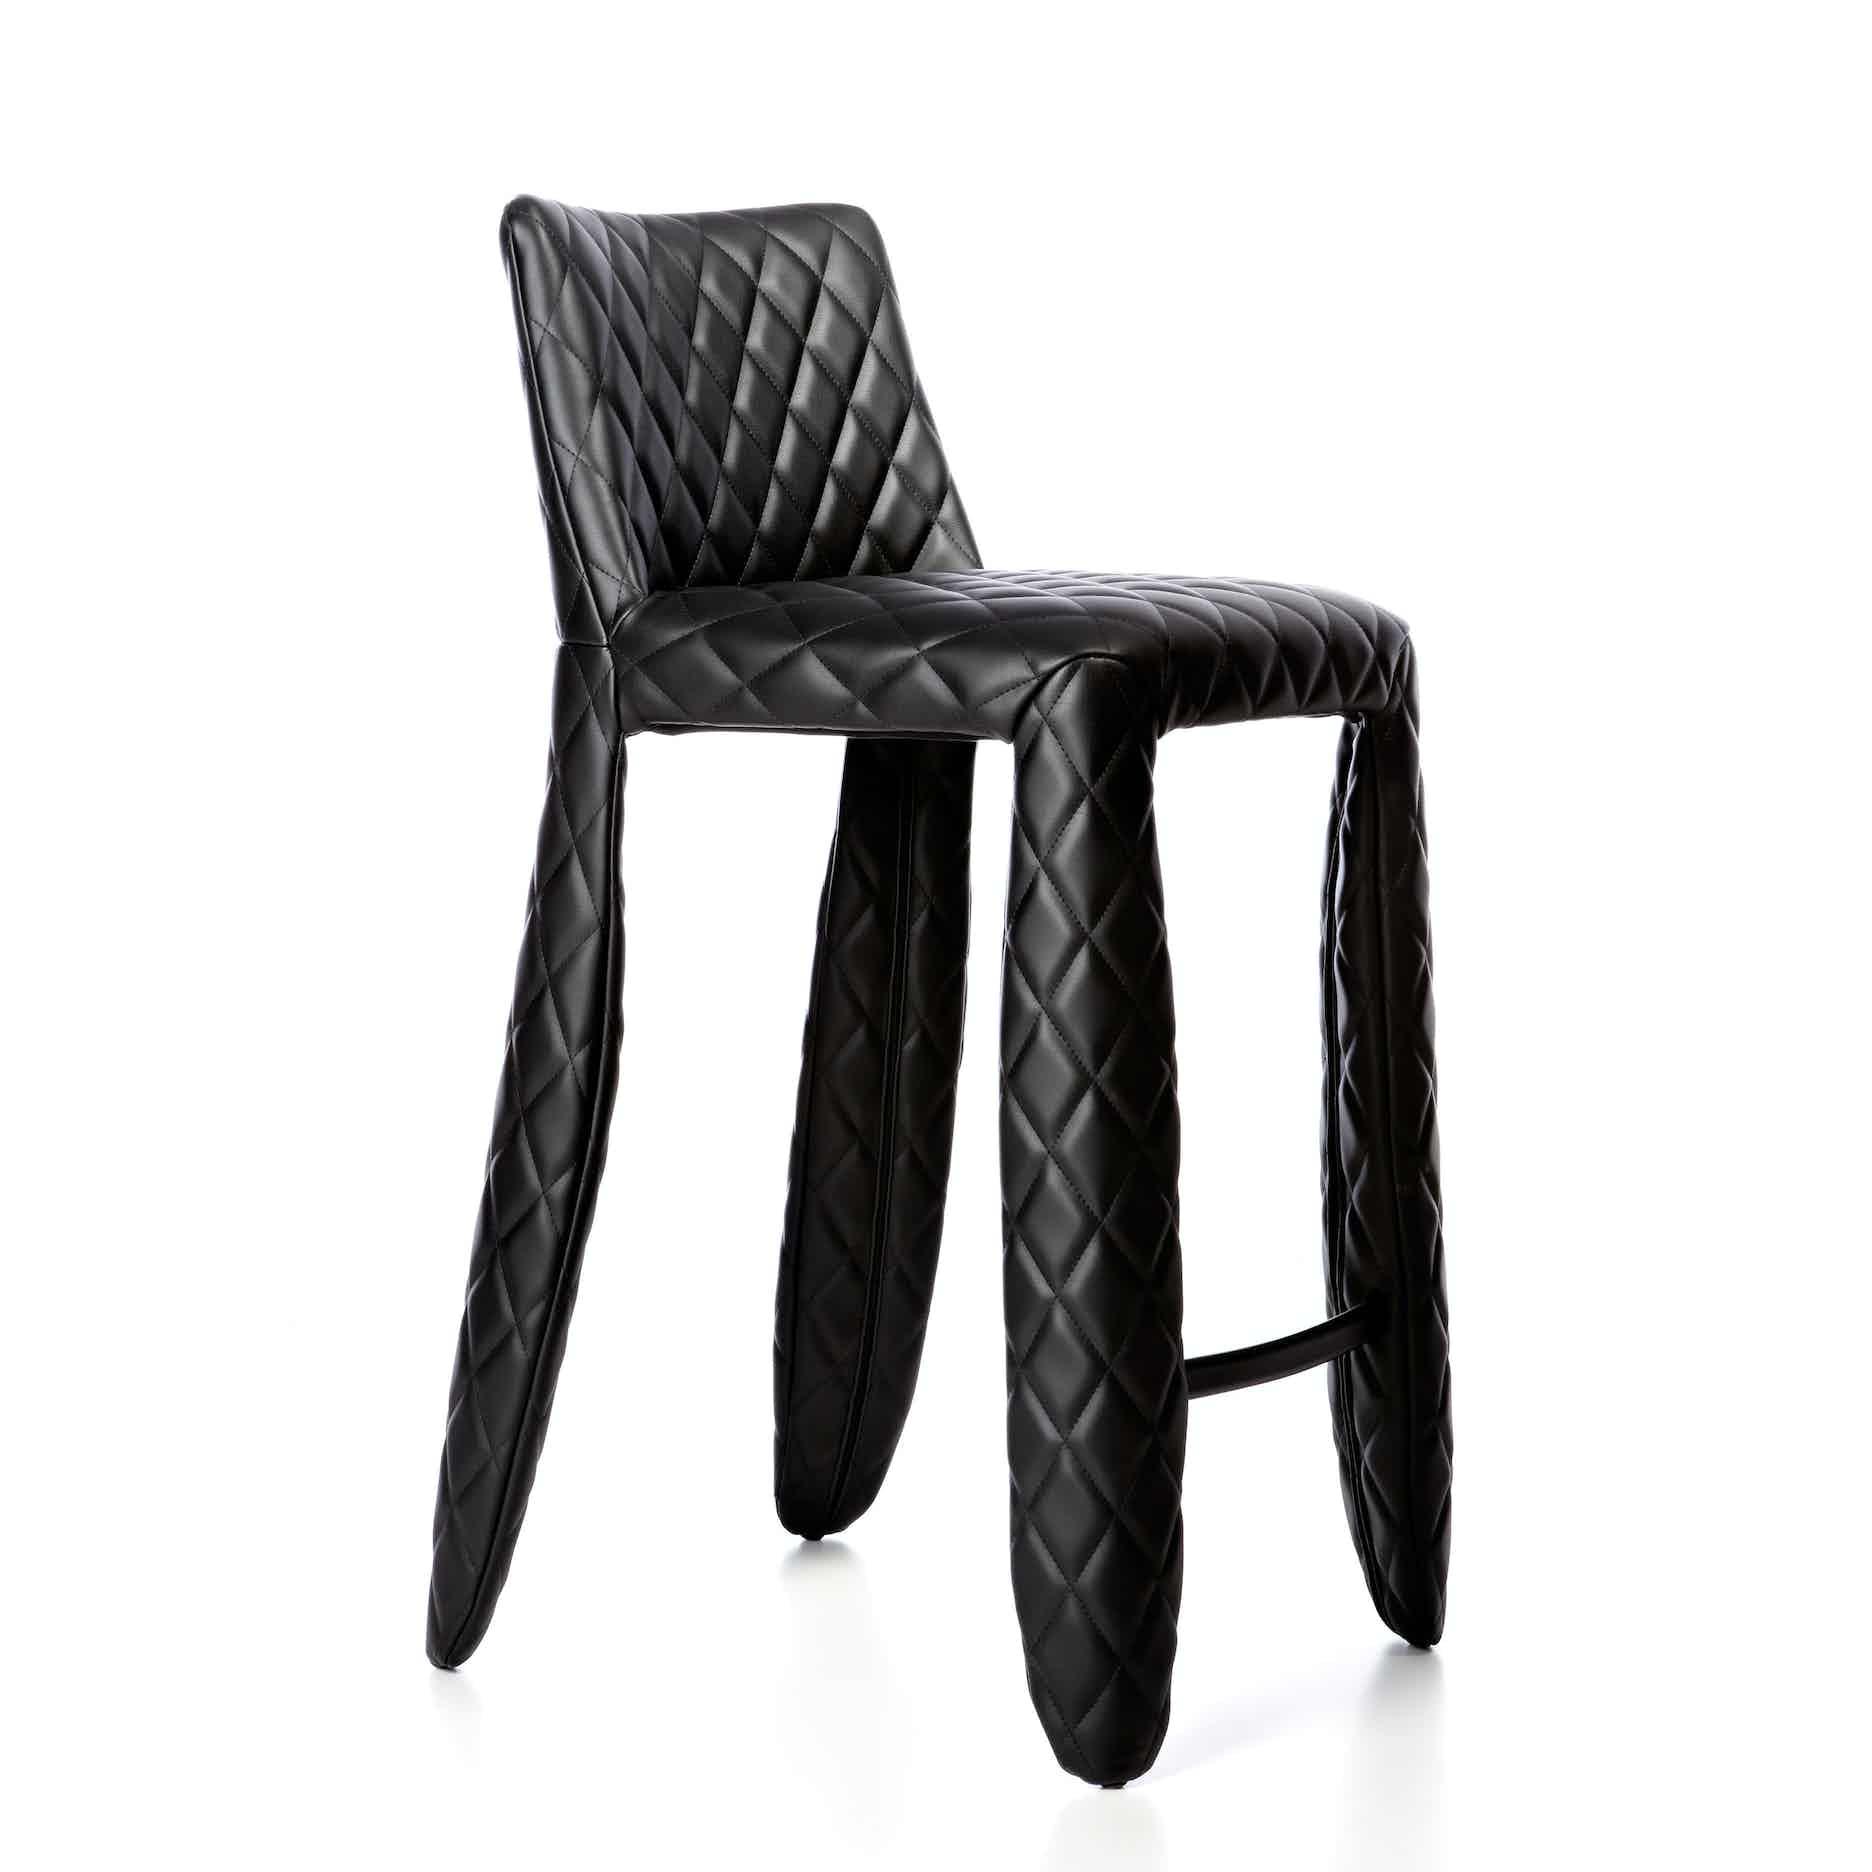 Moooi monster bar stool angle haute living